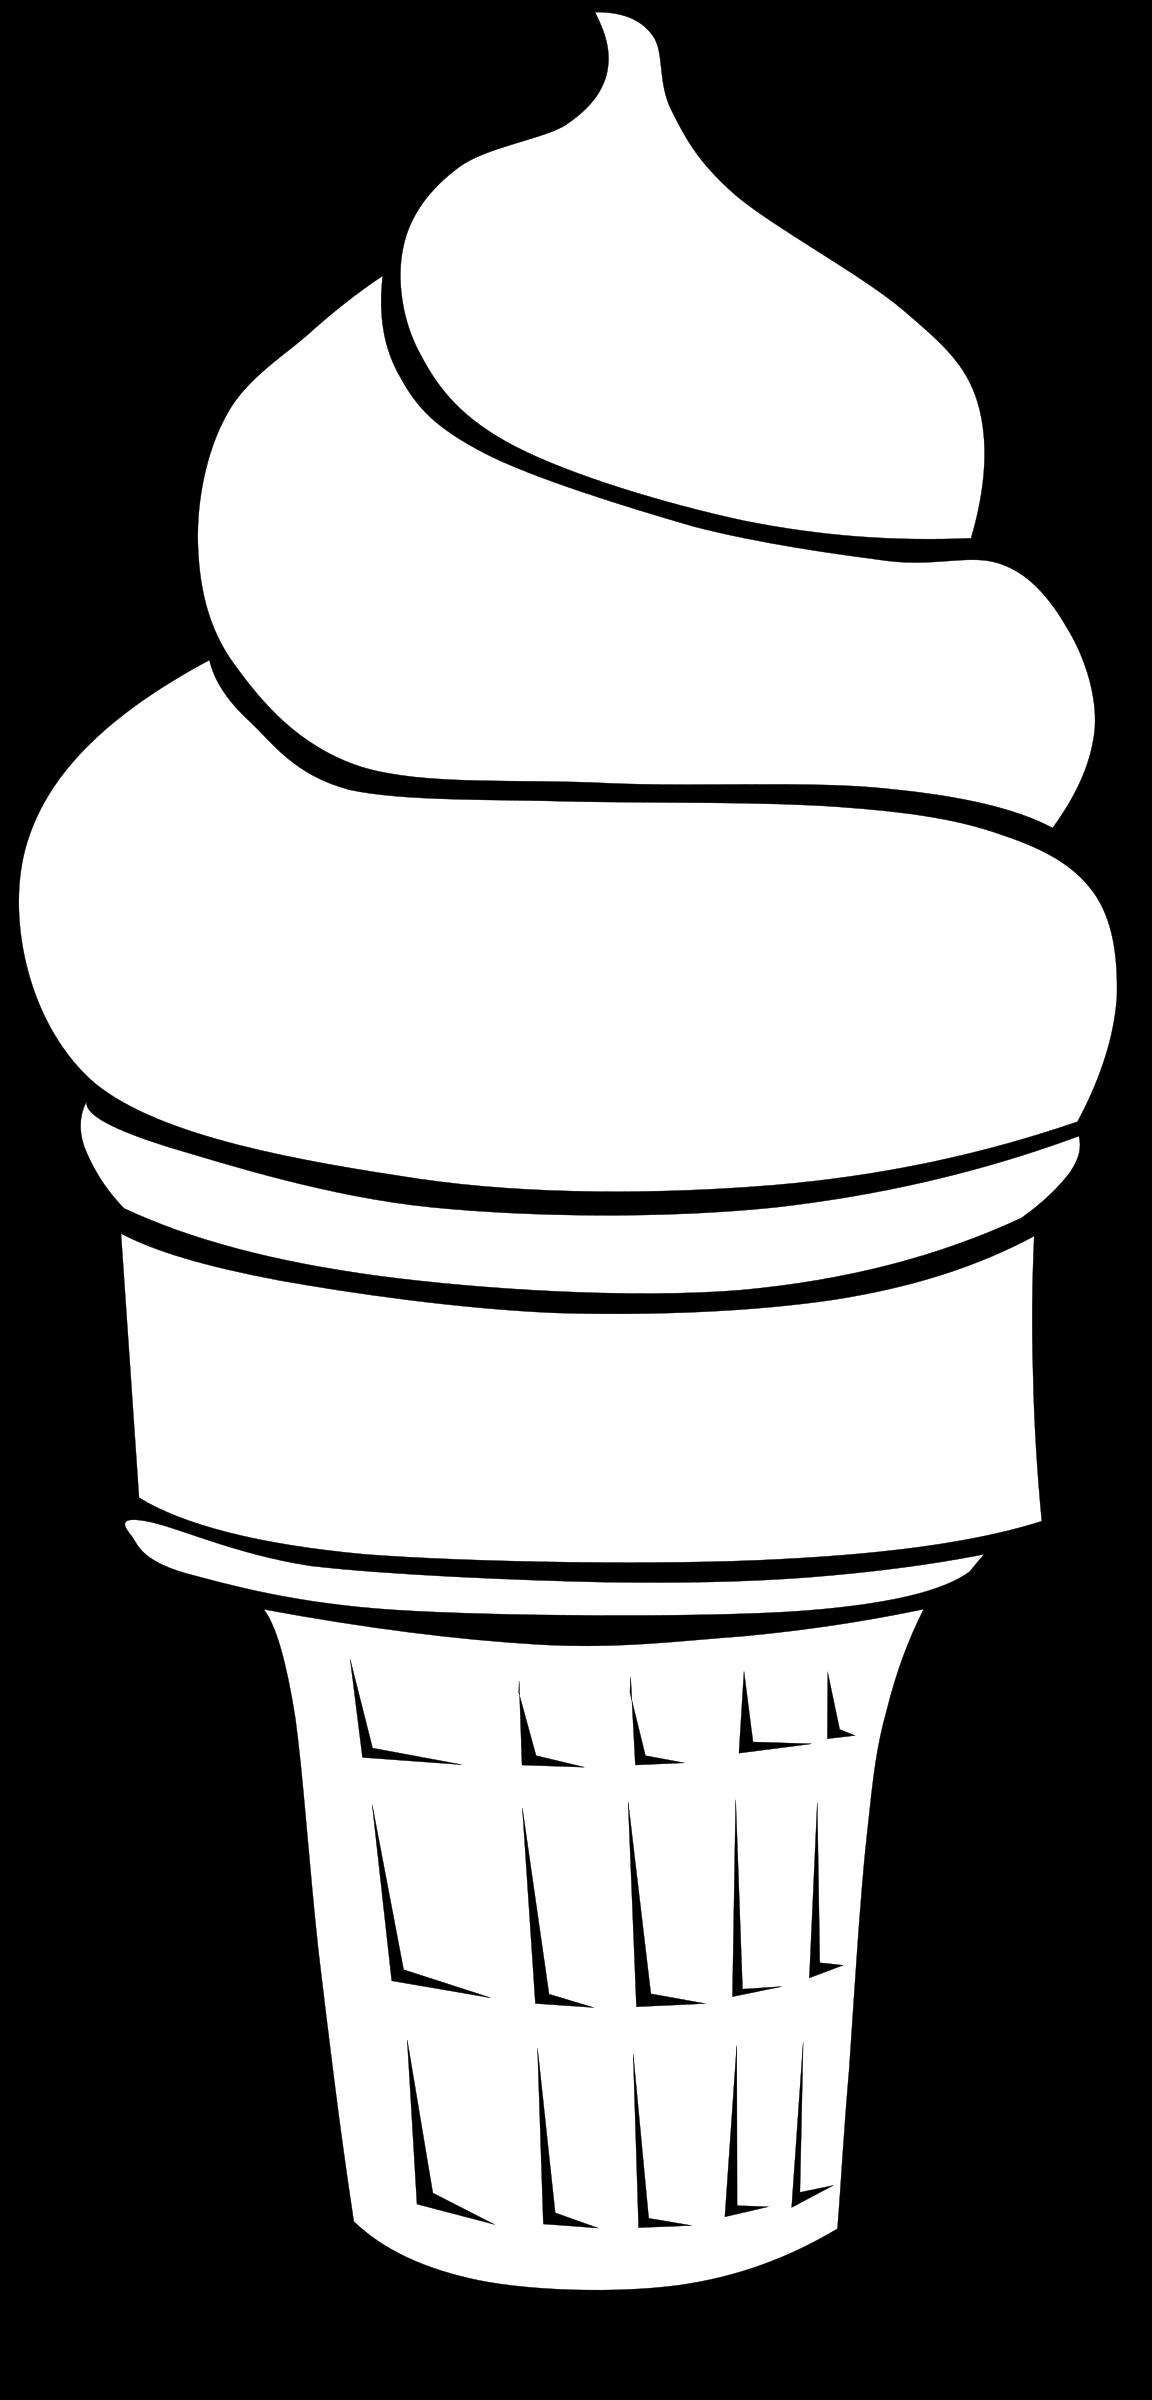 clip art download Ice cream scoop clipart black and white. Line art big image